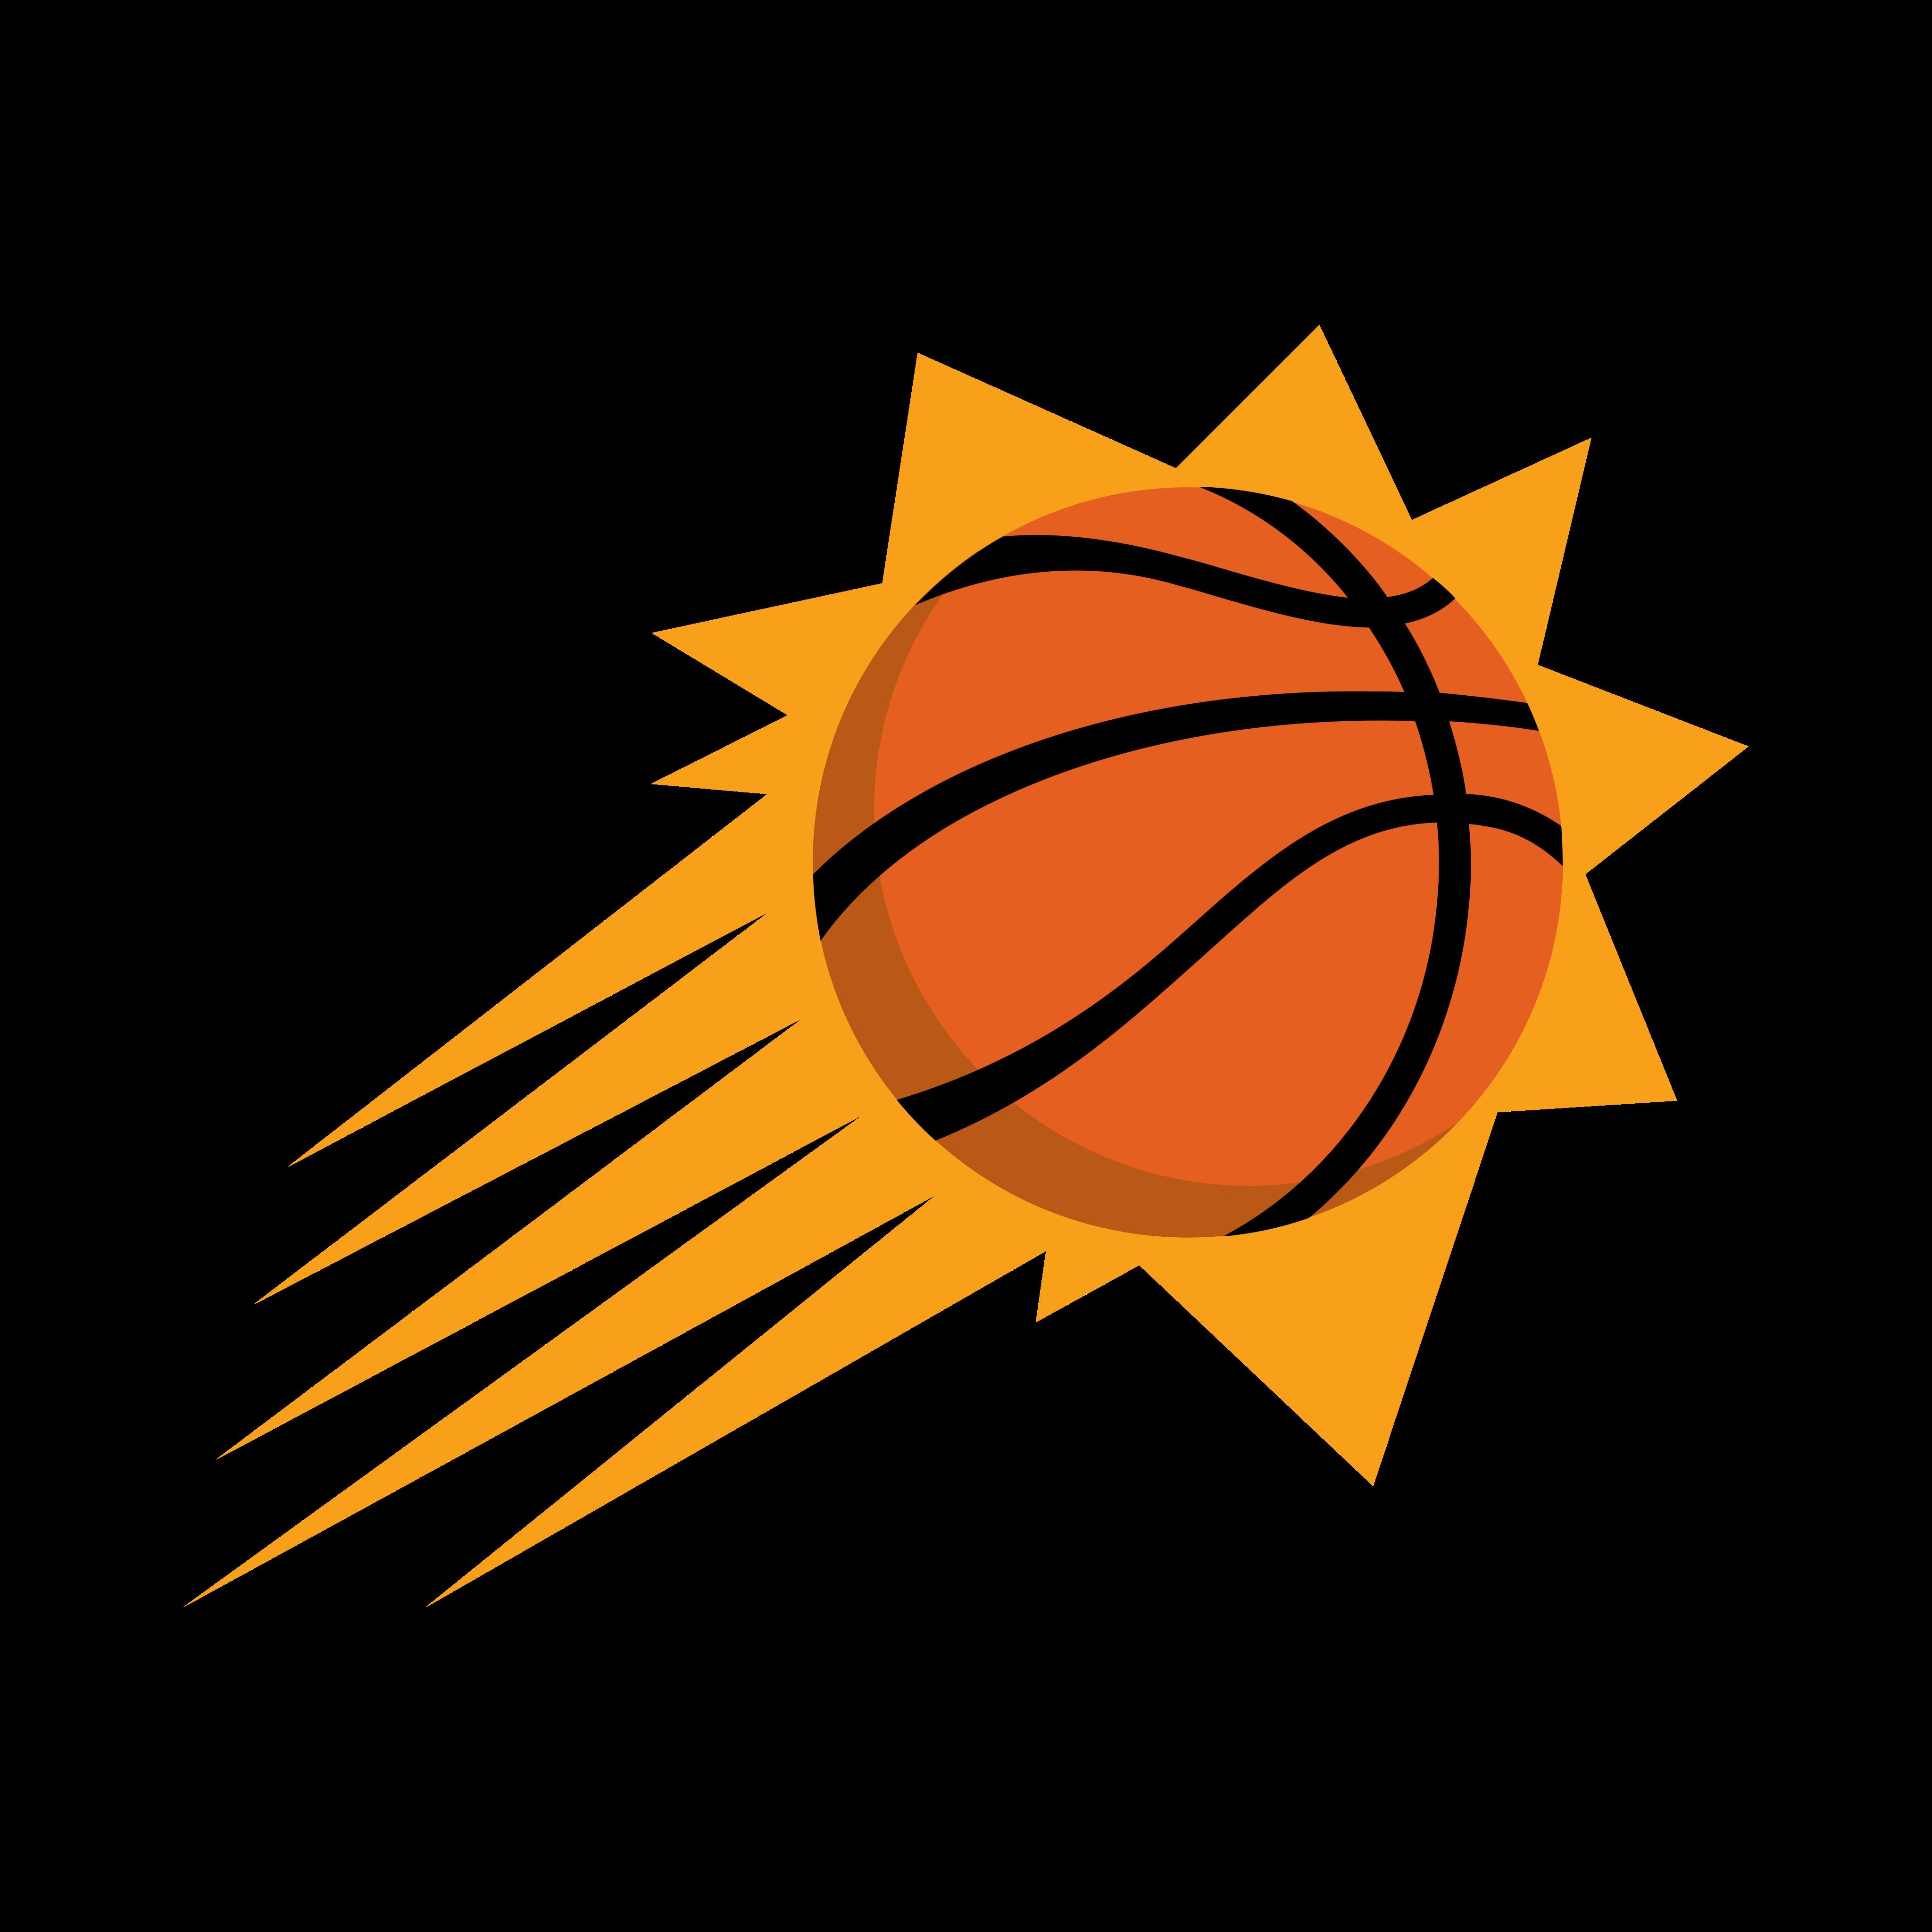 phoenix suns logo 0 - Phoenix Suns Logo